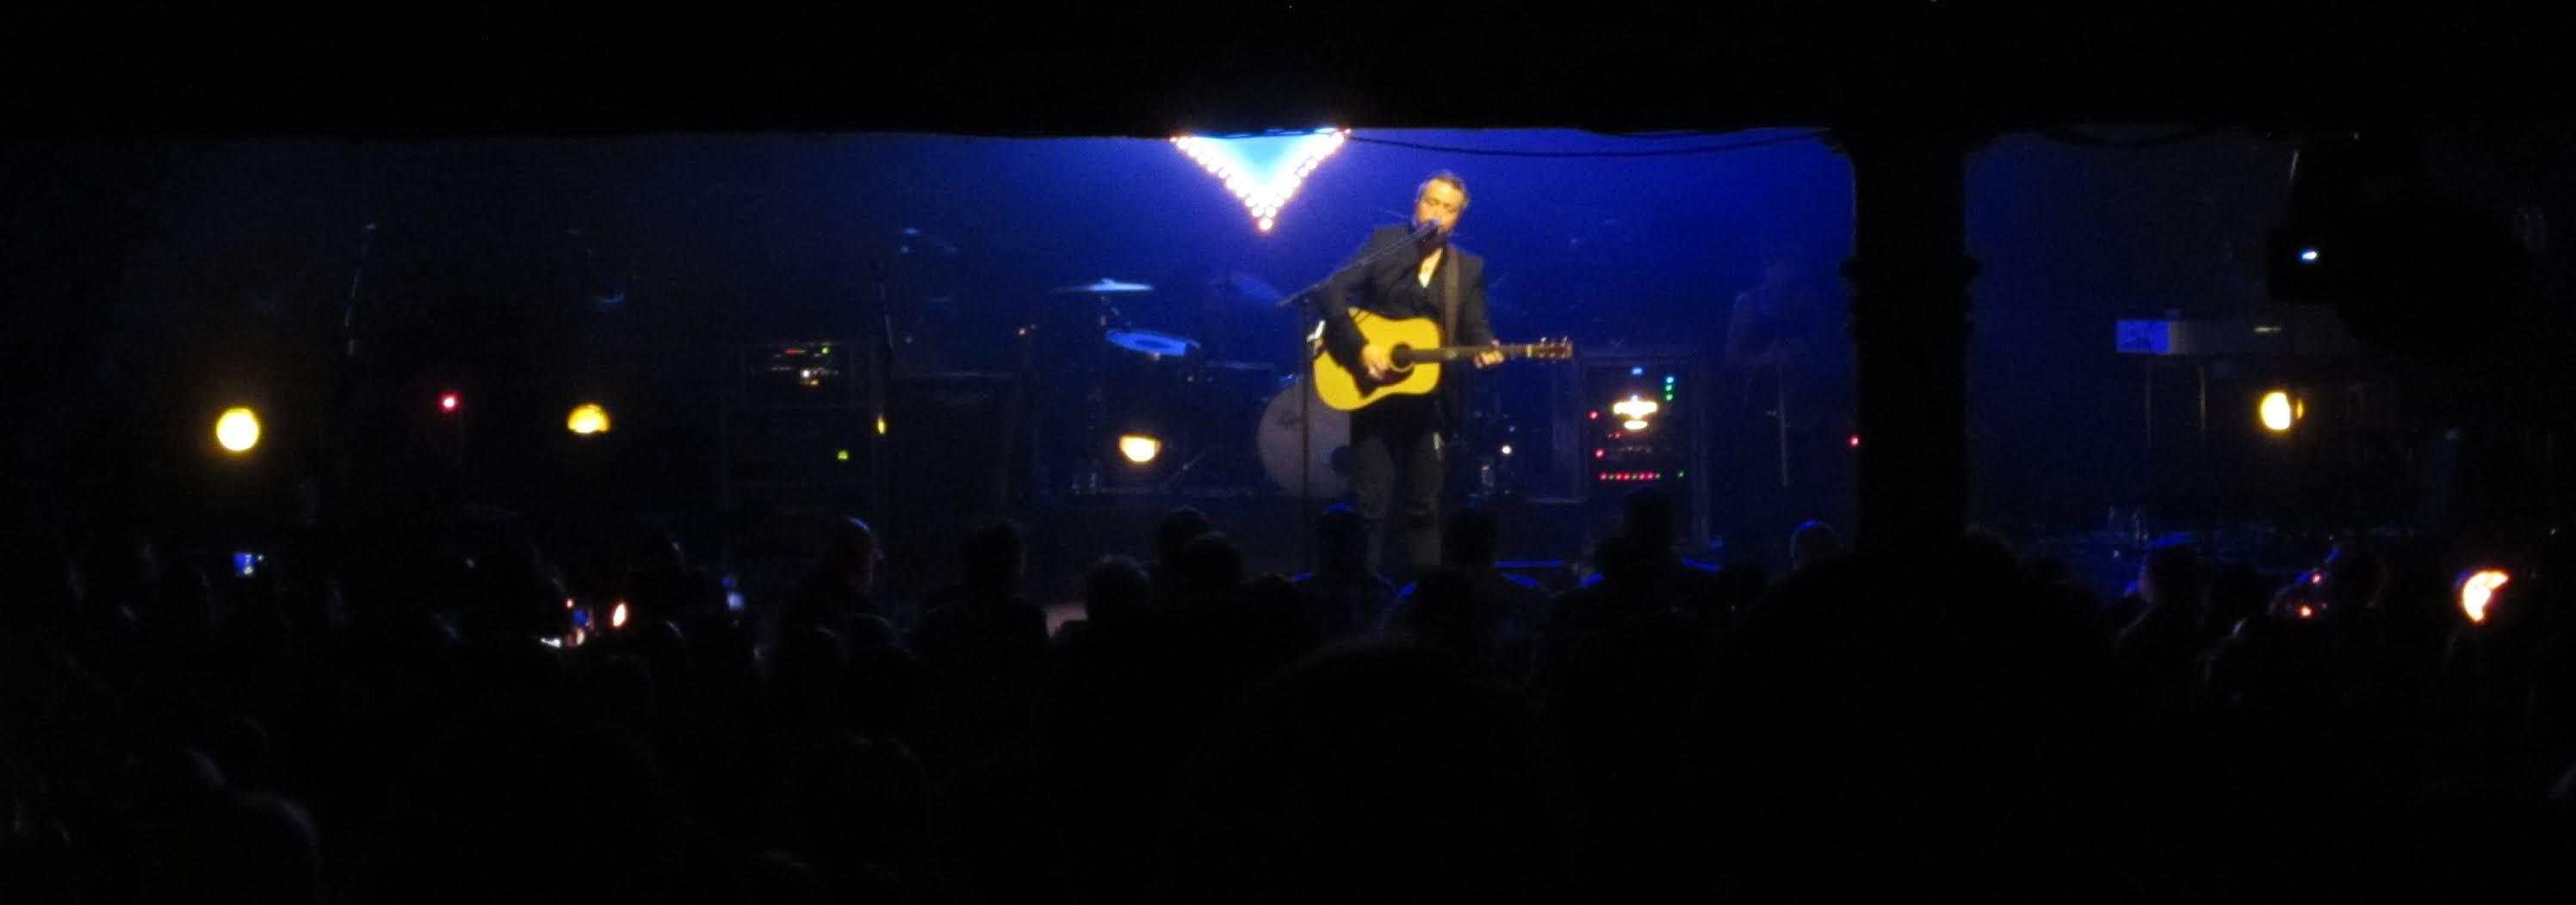 Jason Isbell performing at the Ryman Auditorium